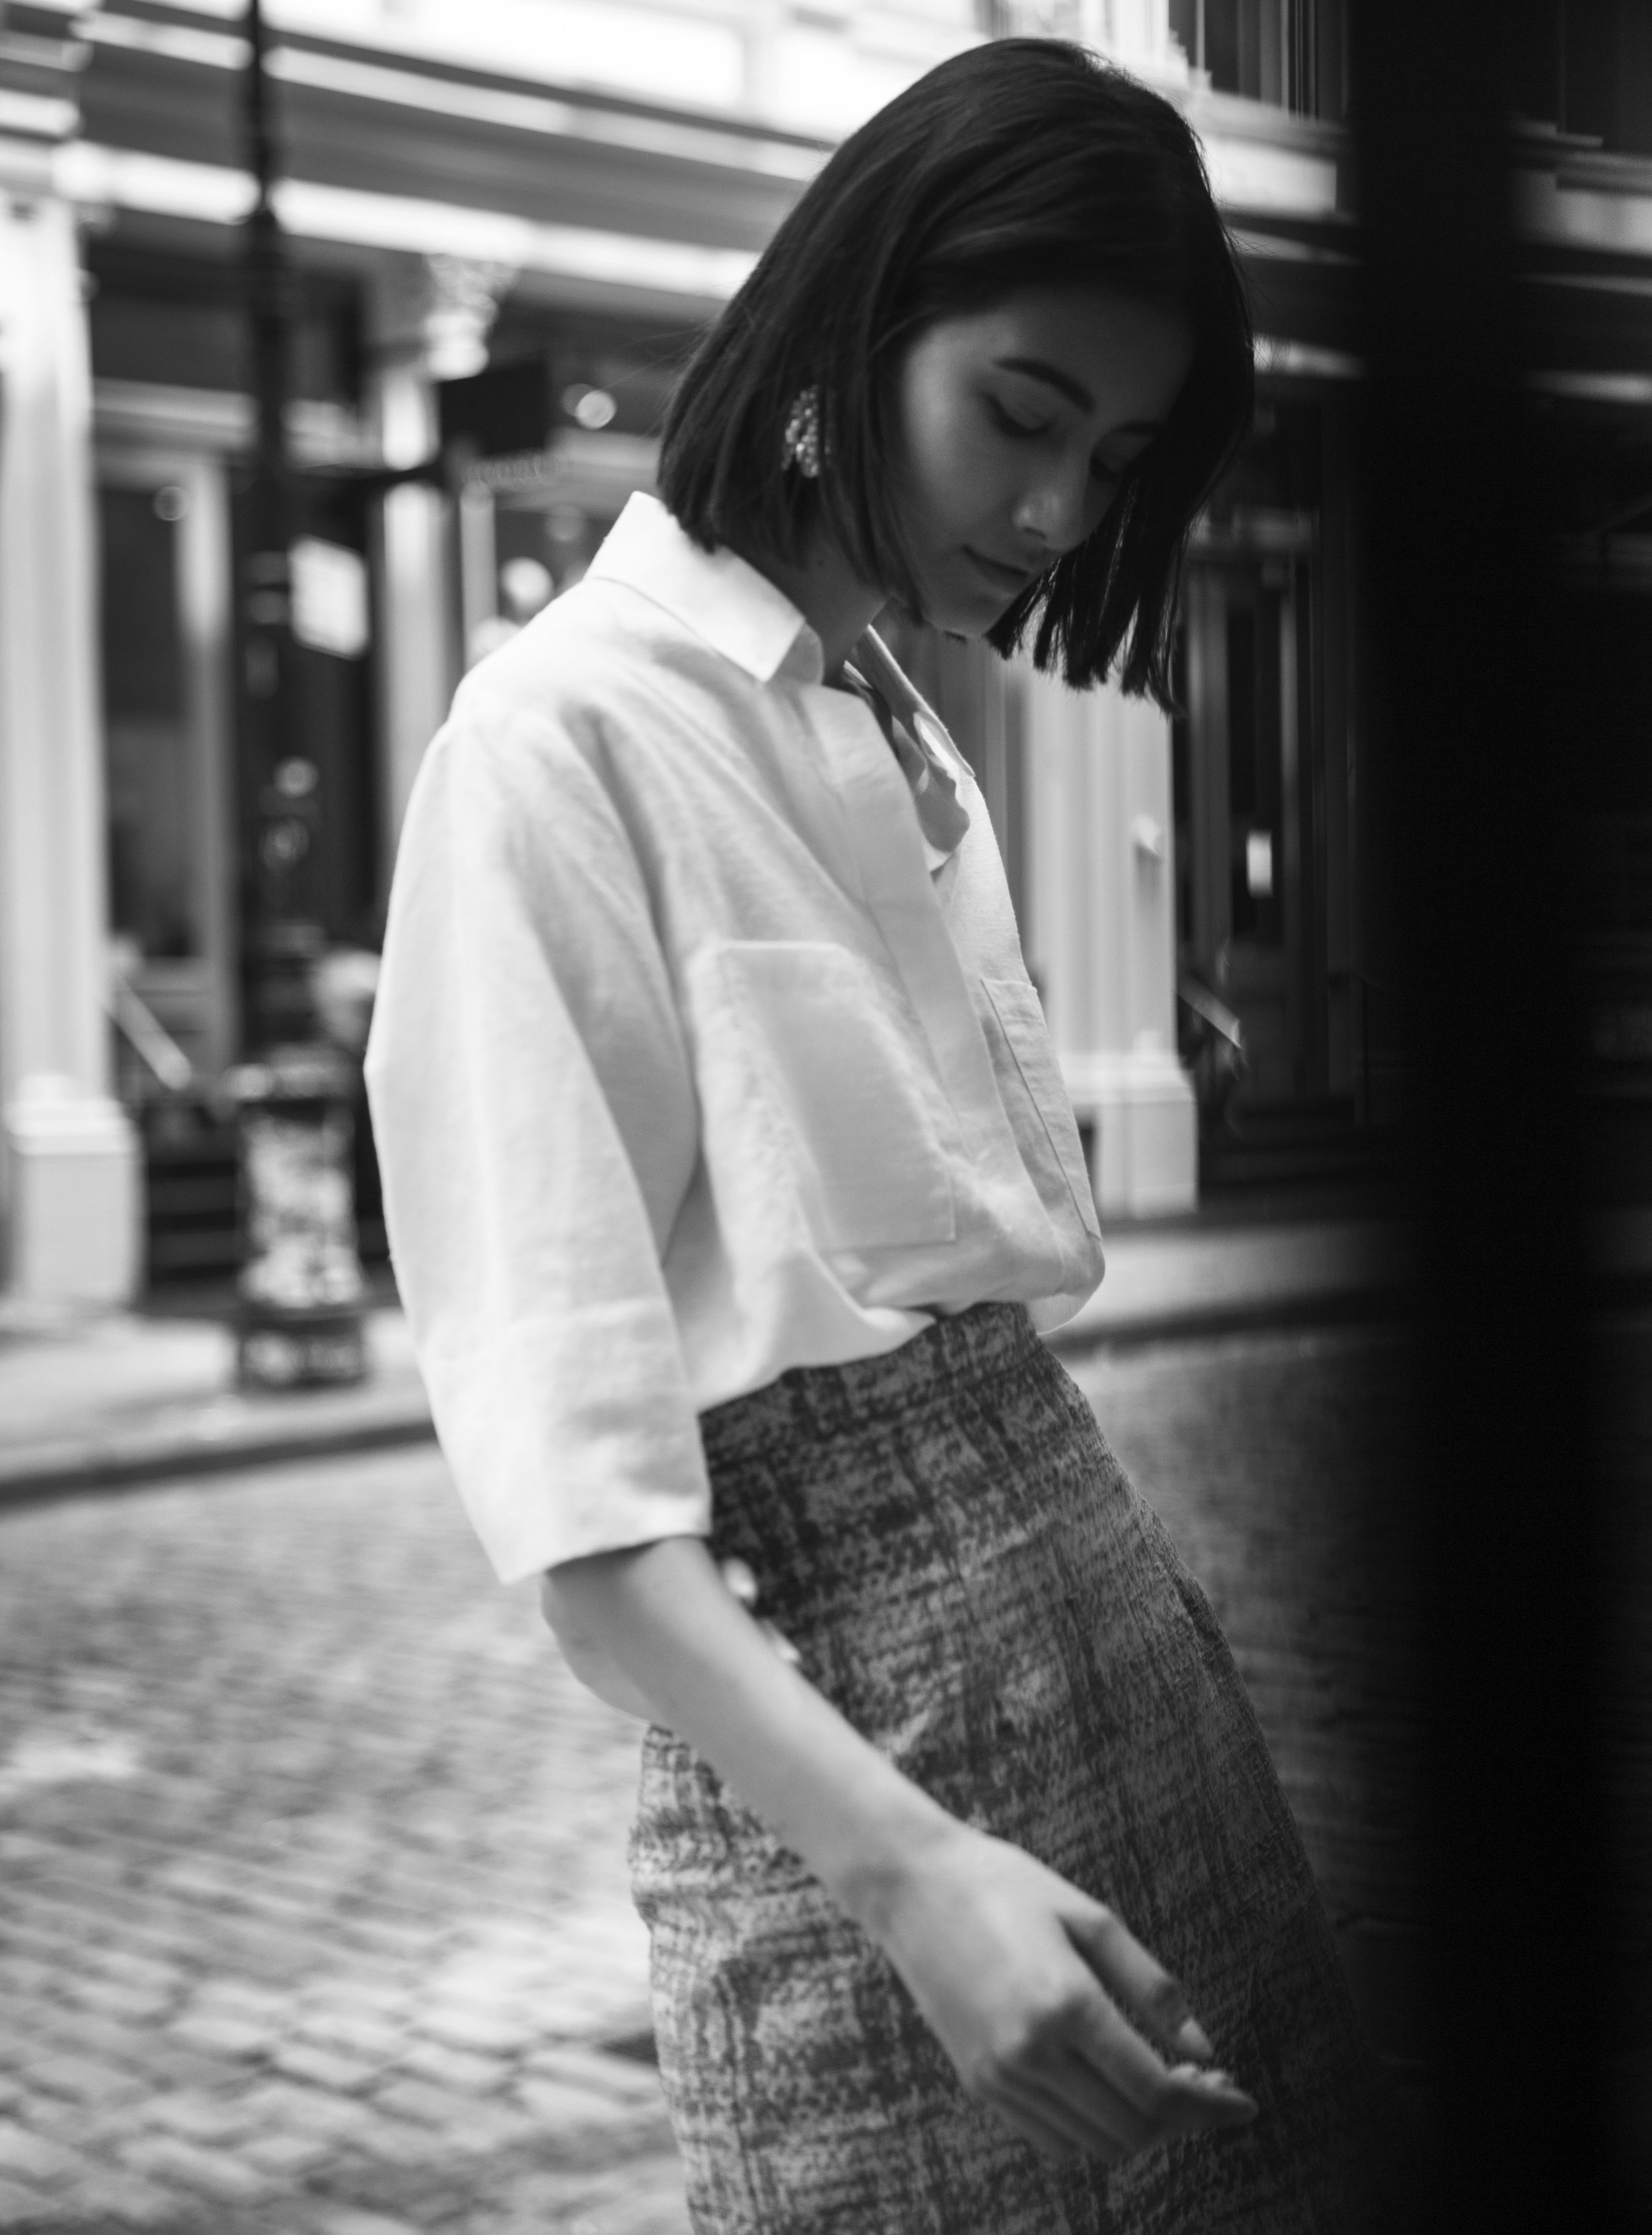 Juliette Hogan - image 1.jpg